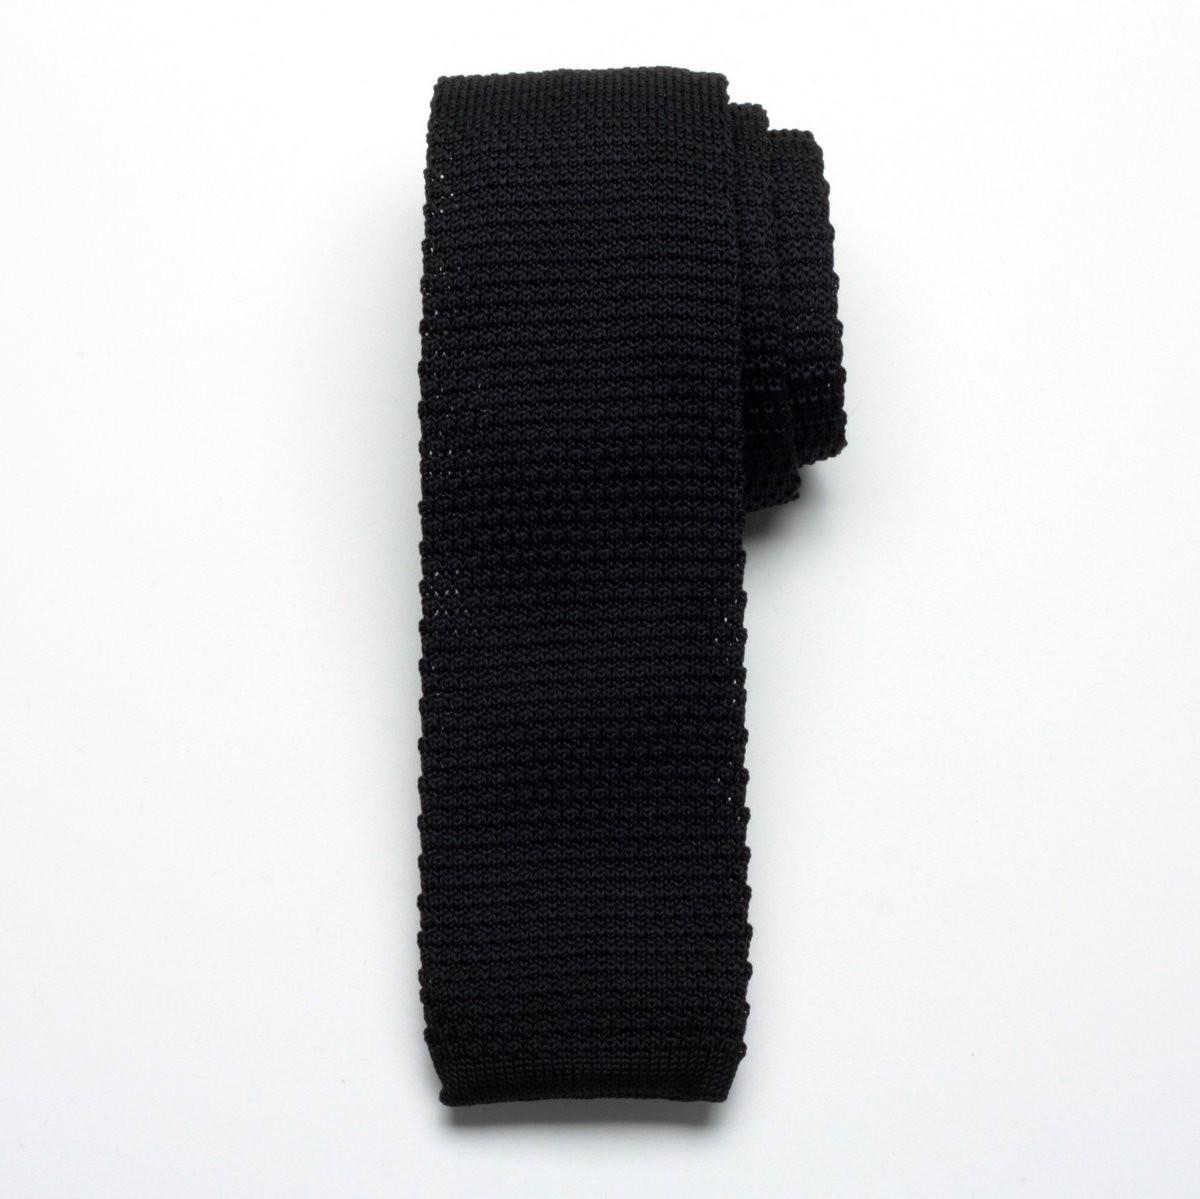 Krawat tkany Willsoor - czarny